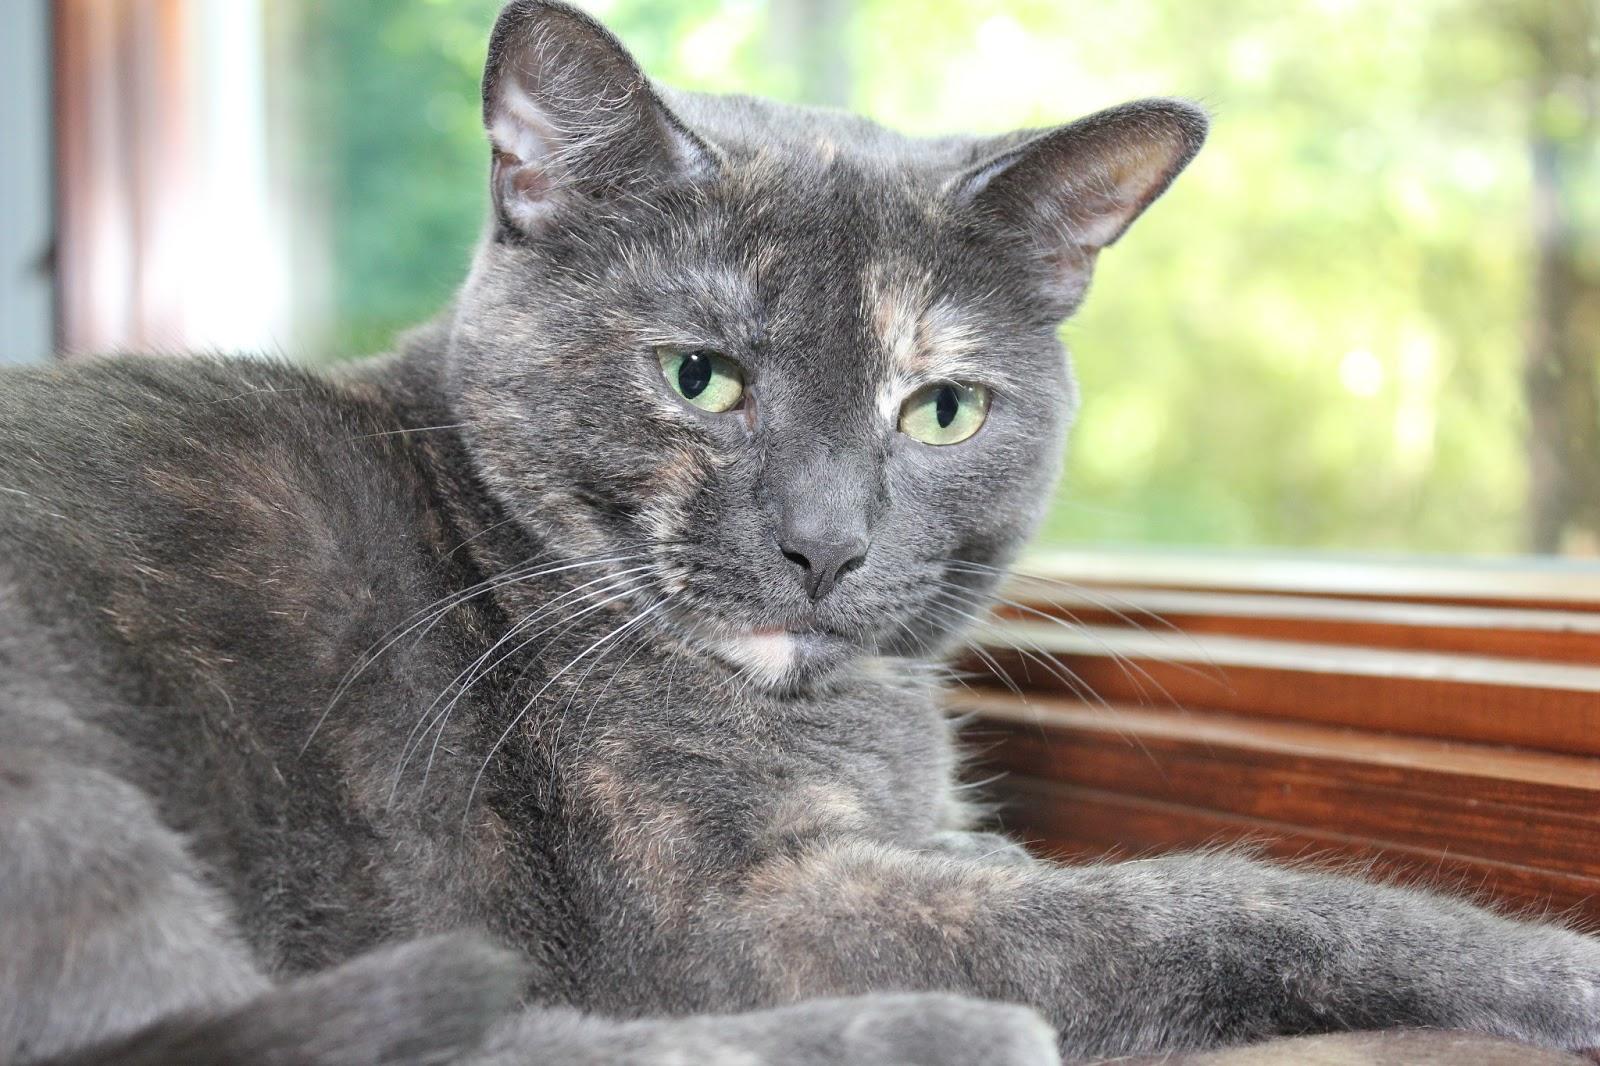 Athena the cat